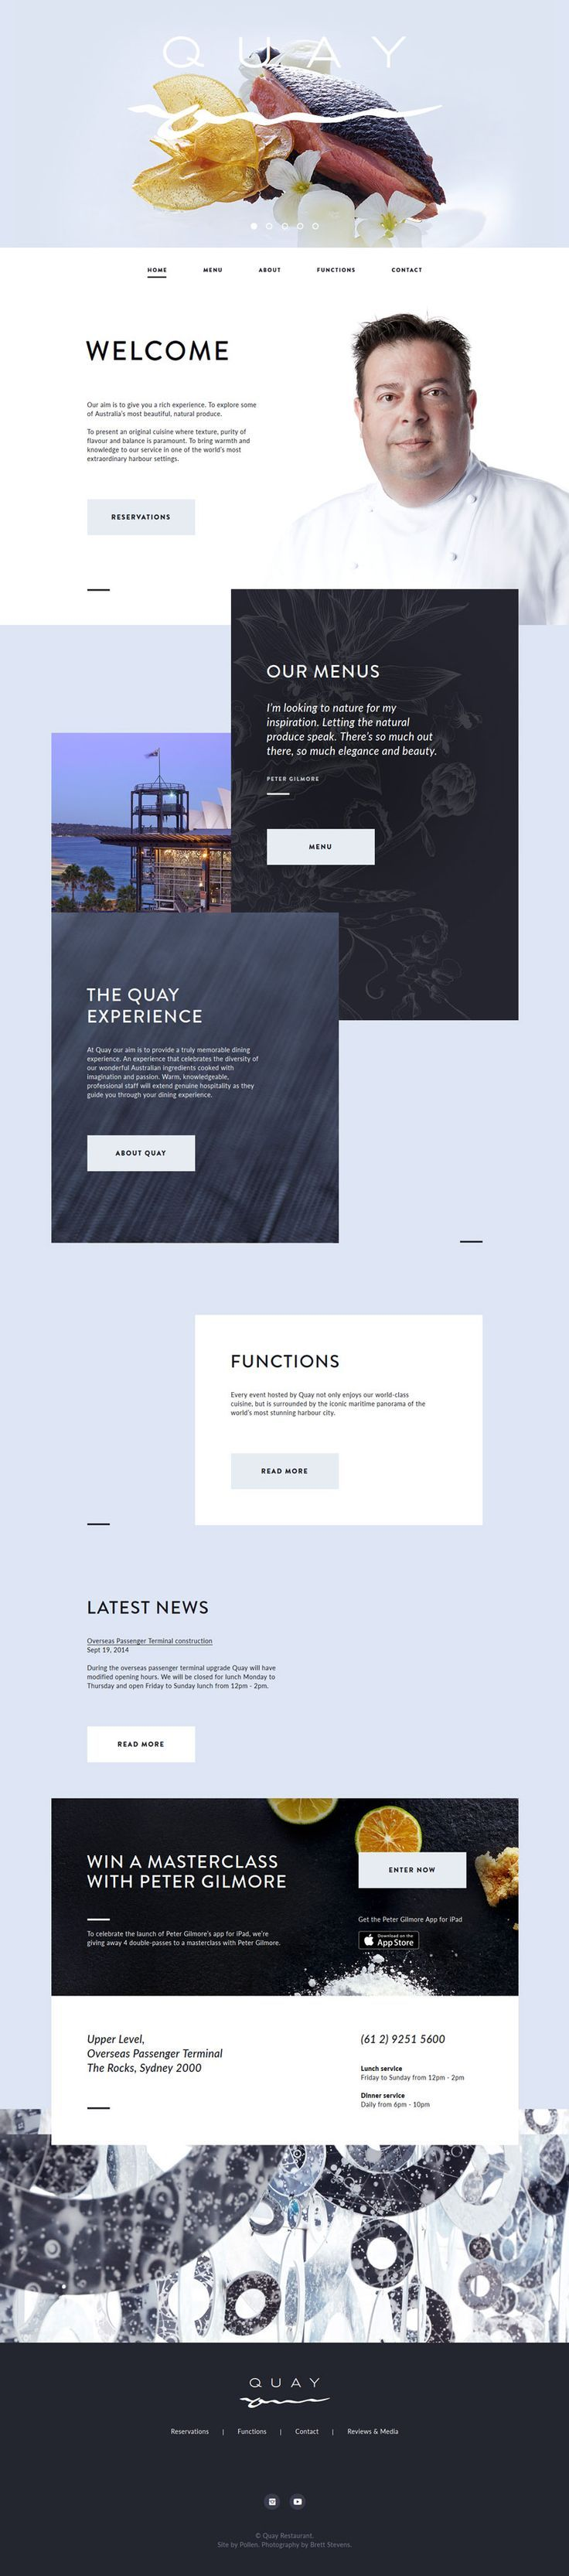 Quay, flat design website, restaurant